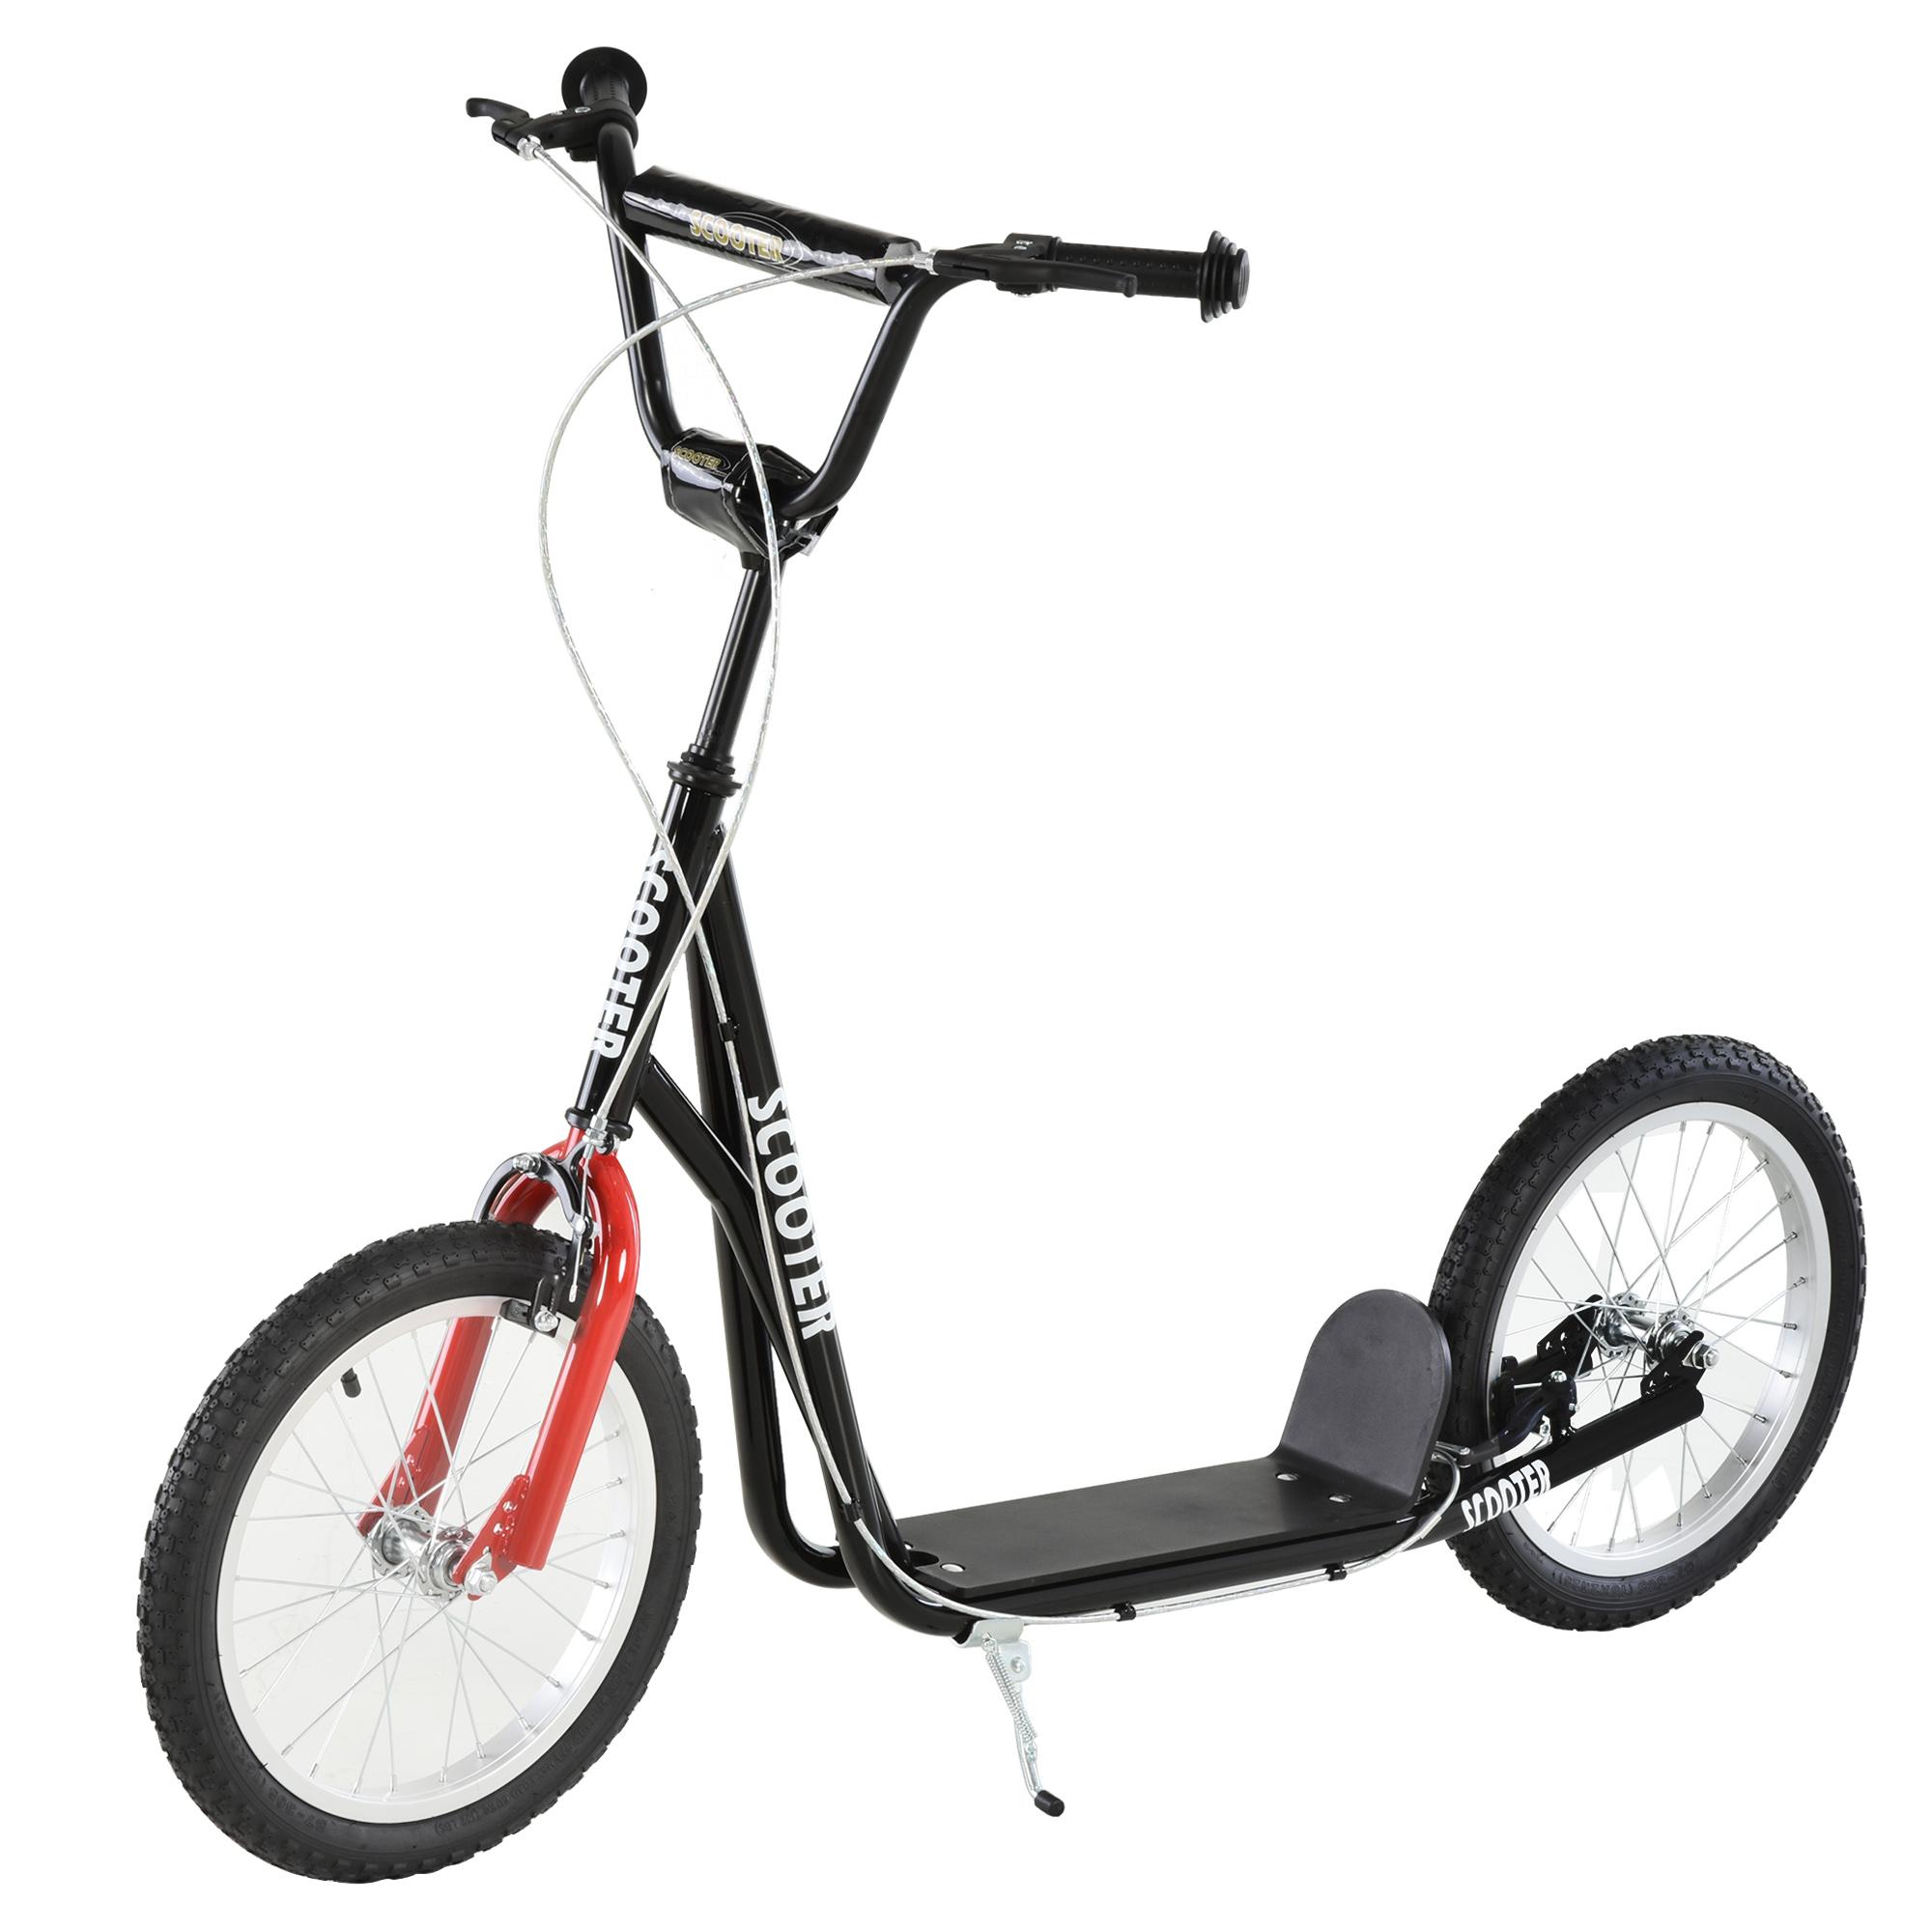 Indexbild 36 - HOMCOM-Tretroller-Kinderroller-Scooter-Cityroller-Roller-verstellbar-Blau-Gruen